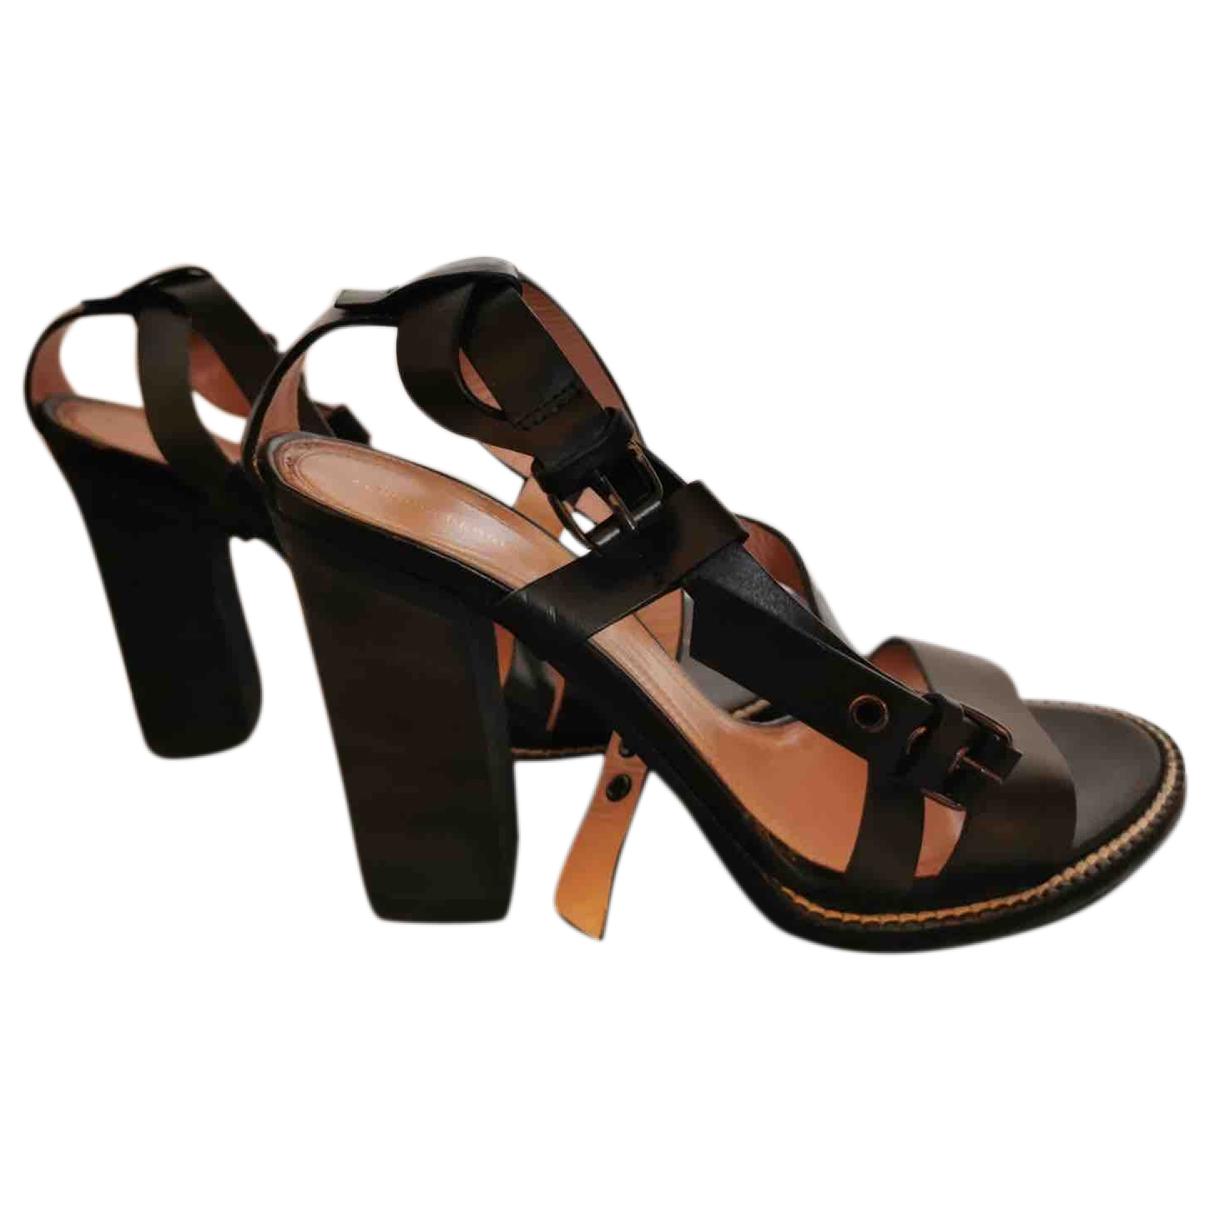 Alberta Ferretti \N Black Leather Sandals for Women 38 EU